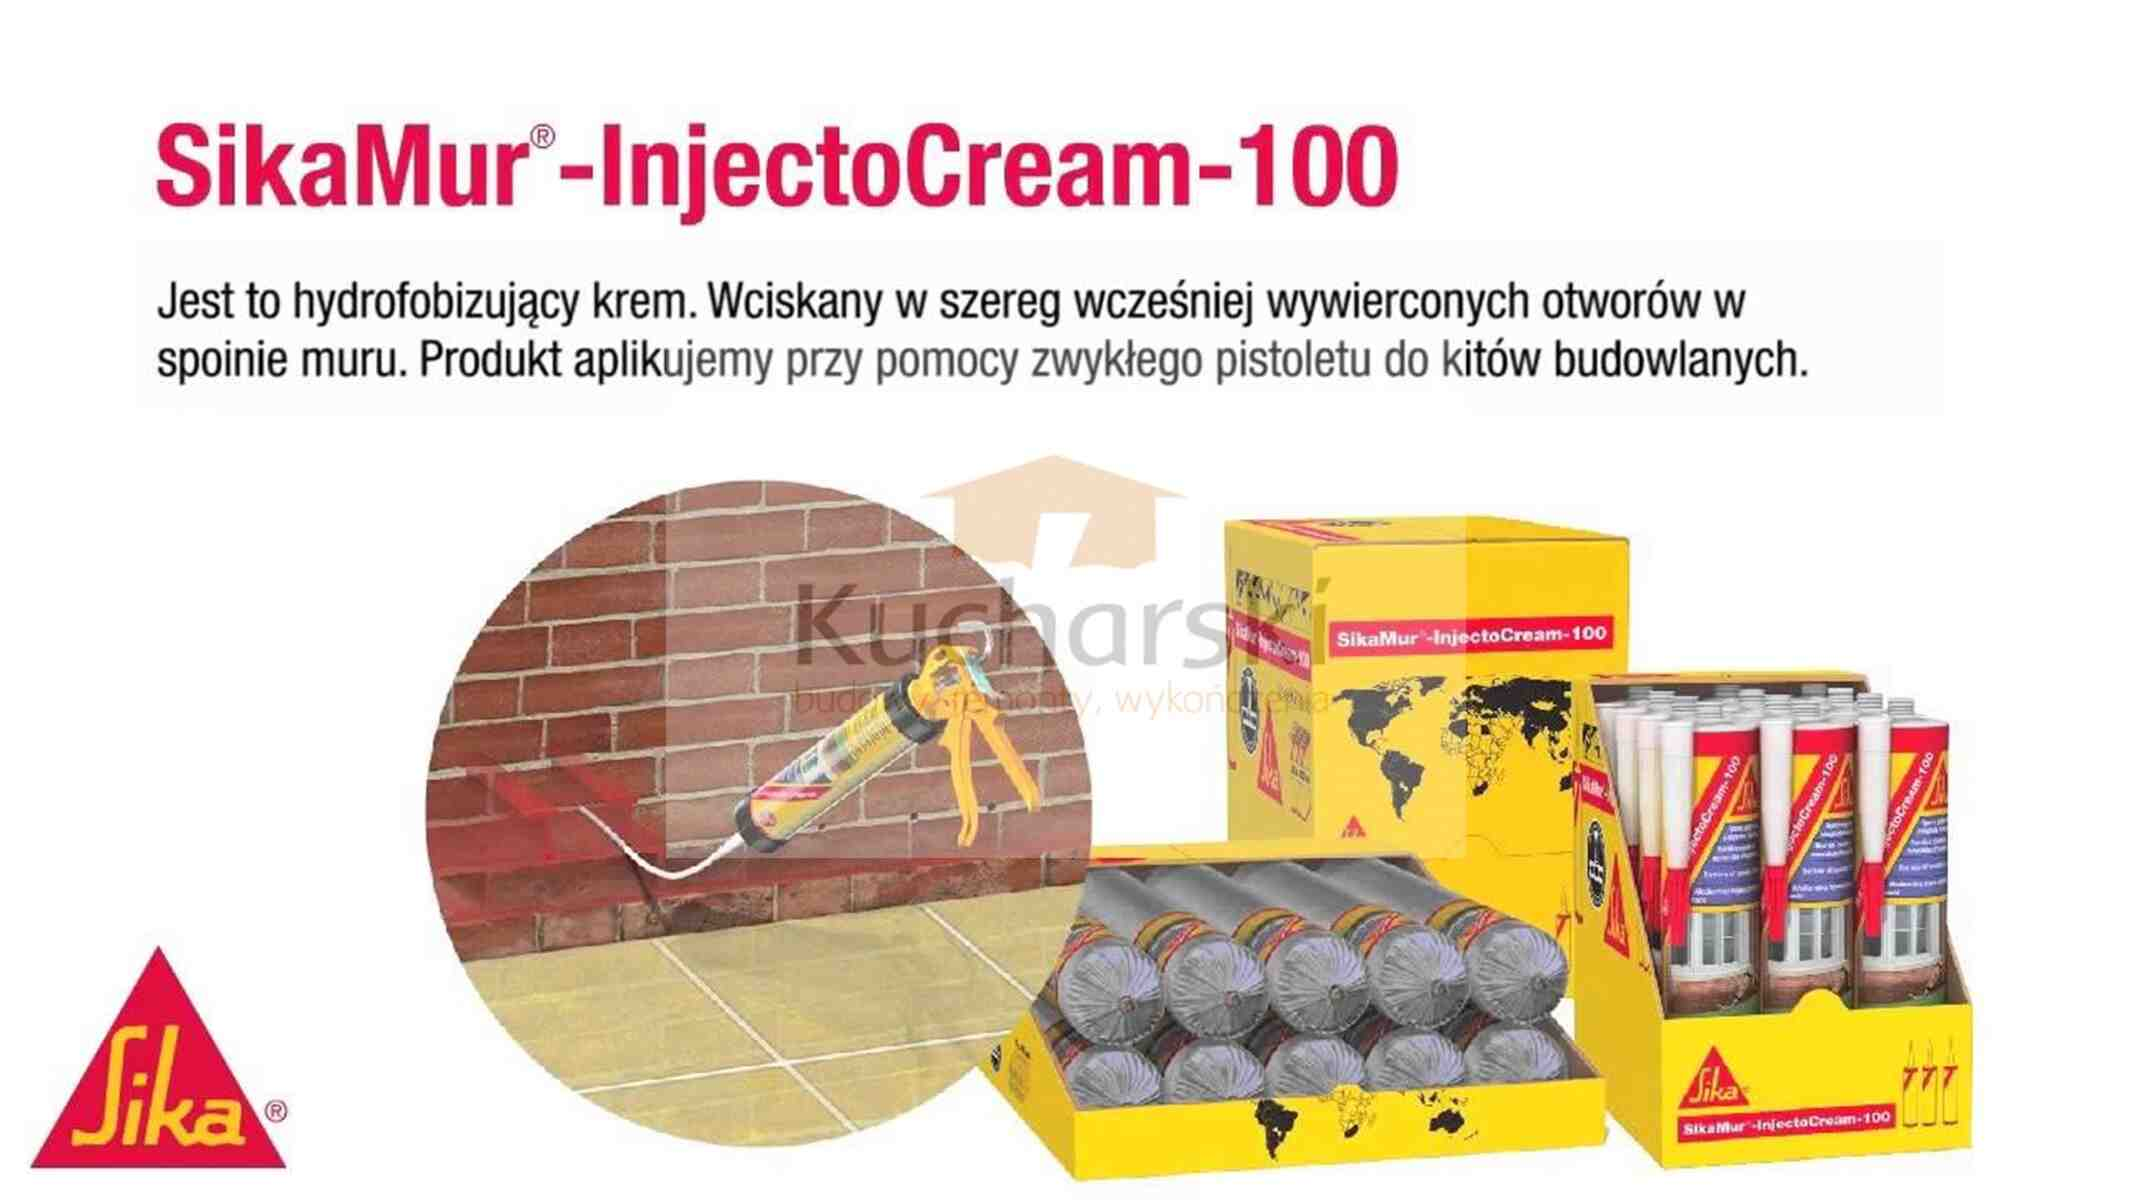 SikaMur ® - InjectoCream - 100